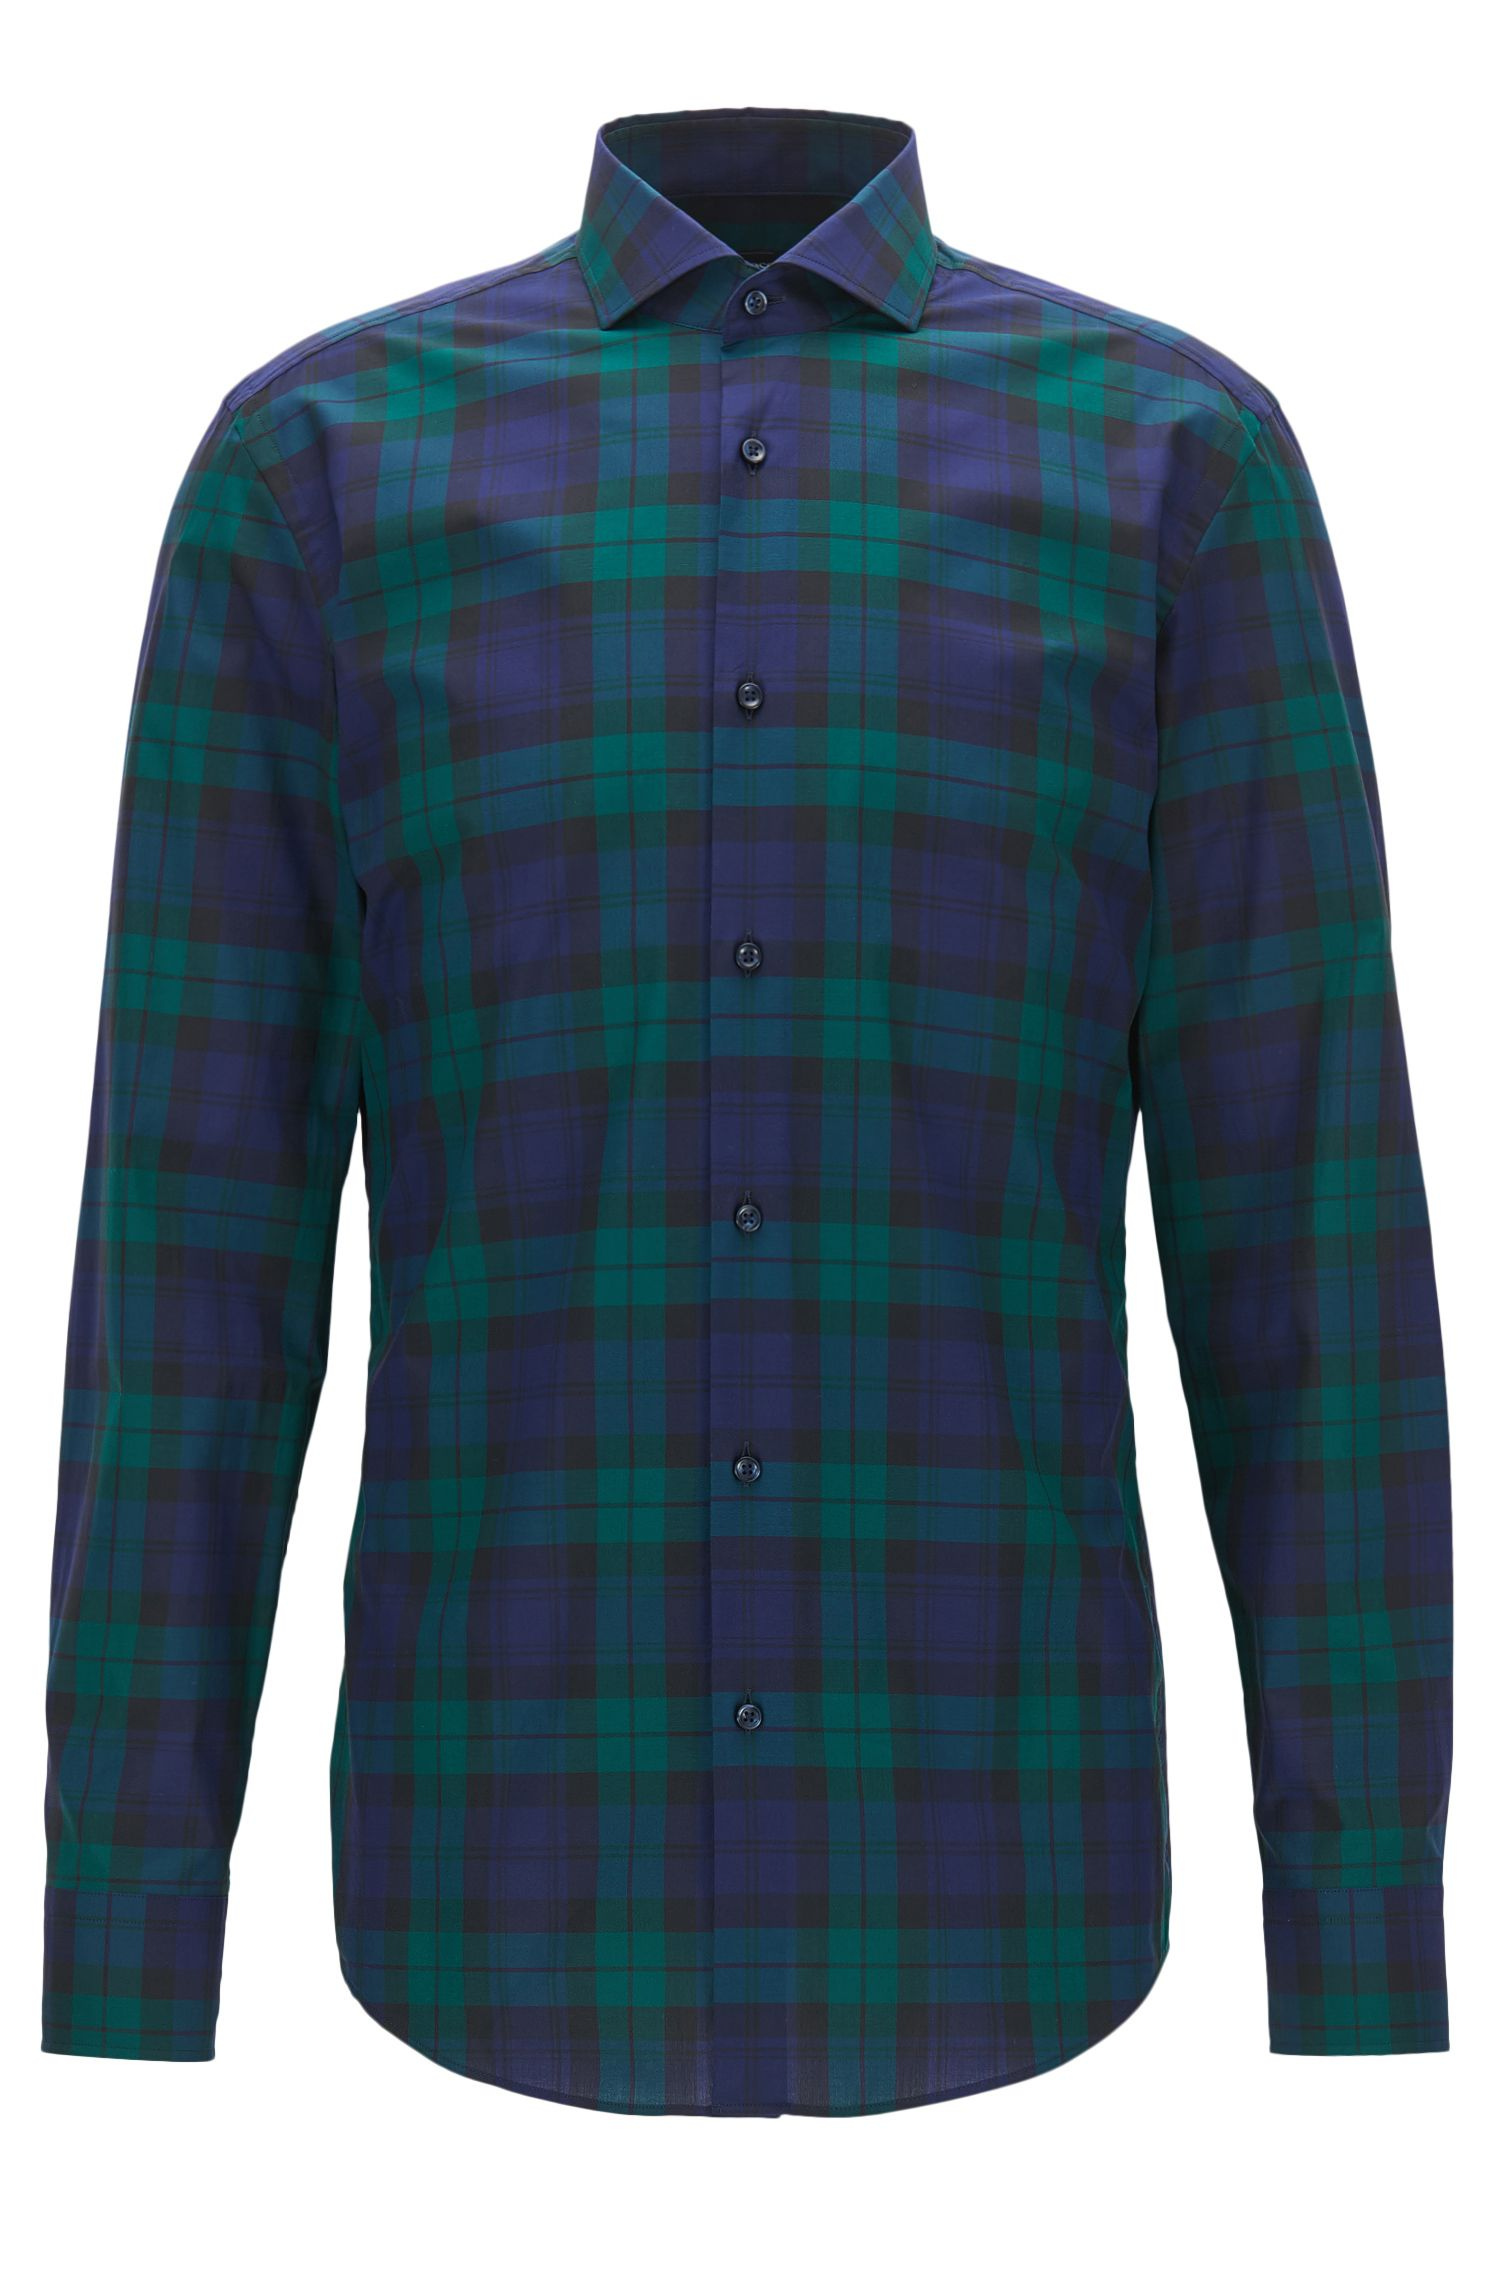 Black Watch Plaid Cotton Dress Shirt, Slim Fit | Jason